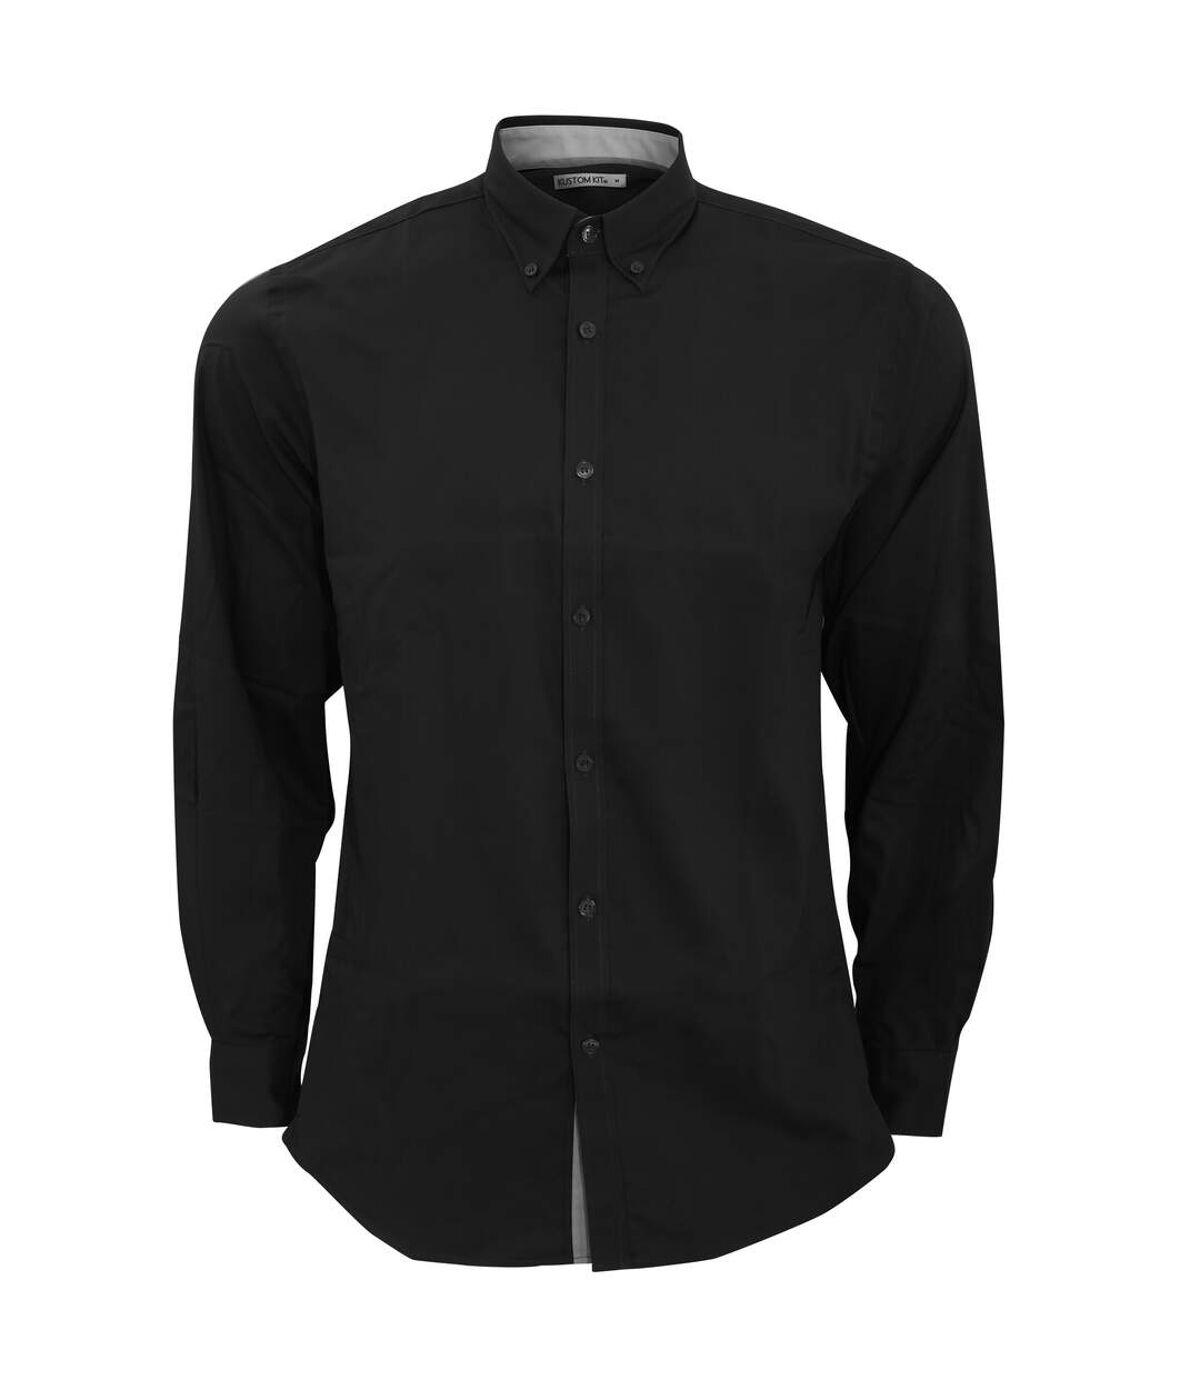 Kustom Kit Mens Contrast Premium Oxford Shirt (Black/Silver) - UTBC2682